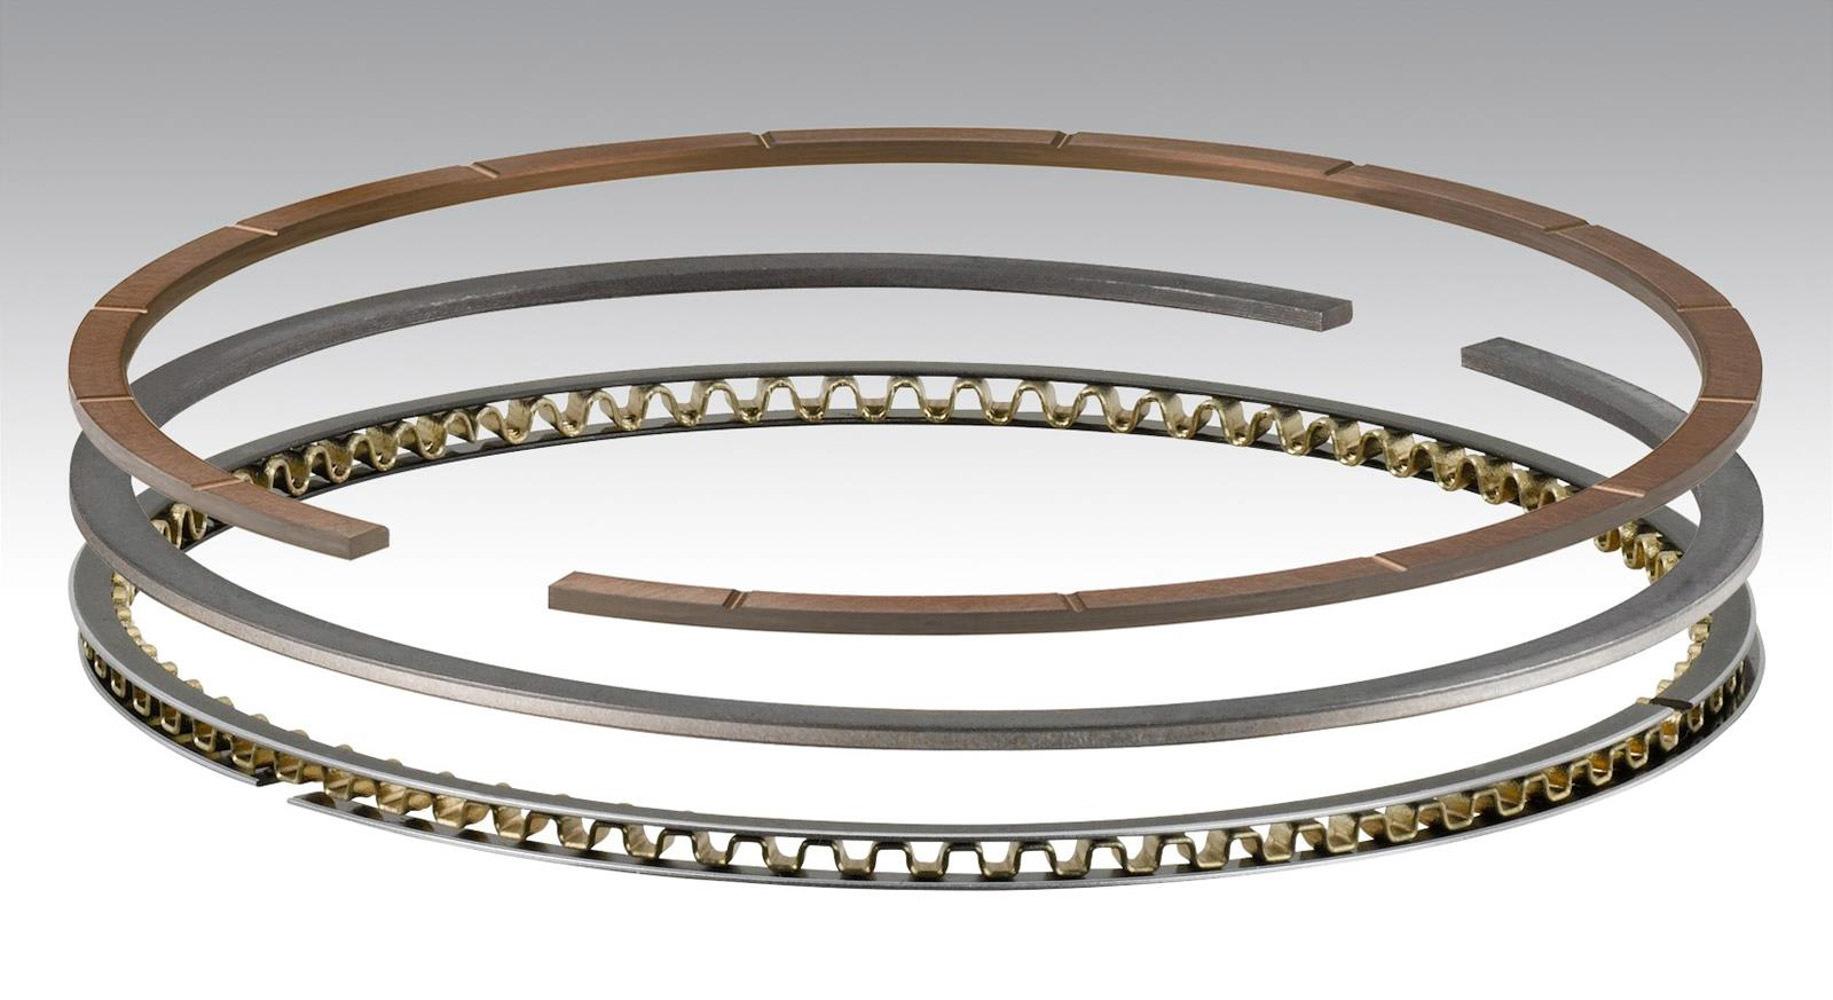 Total Seal CR0690GP-5 GP Piston Ring Set 4.130 Bore 1/16 1/16 3/16